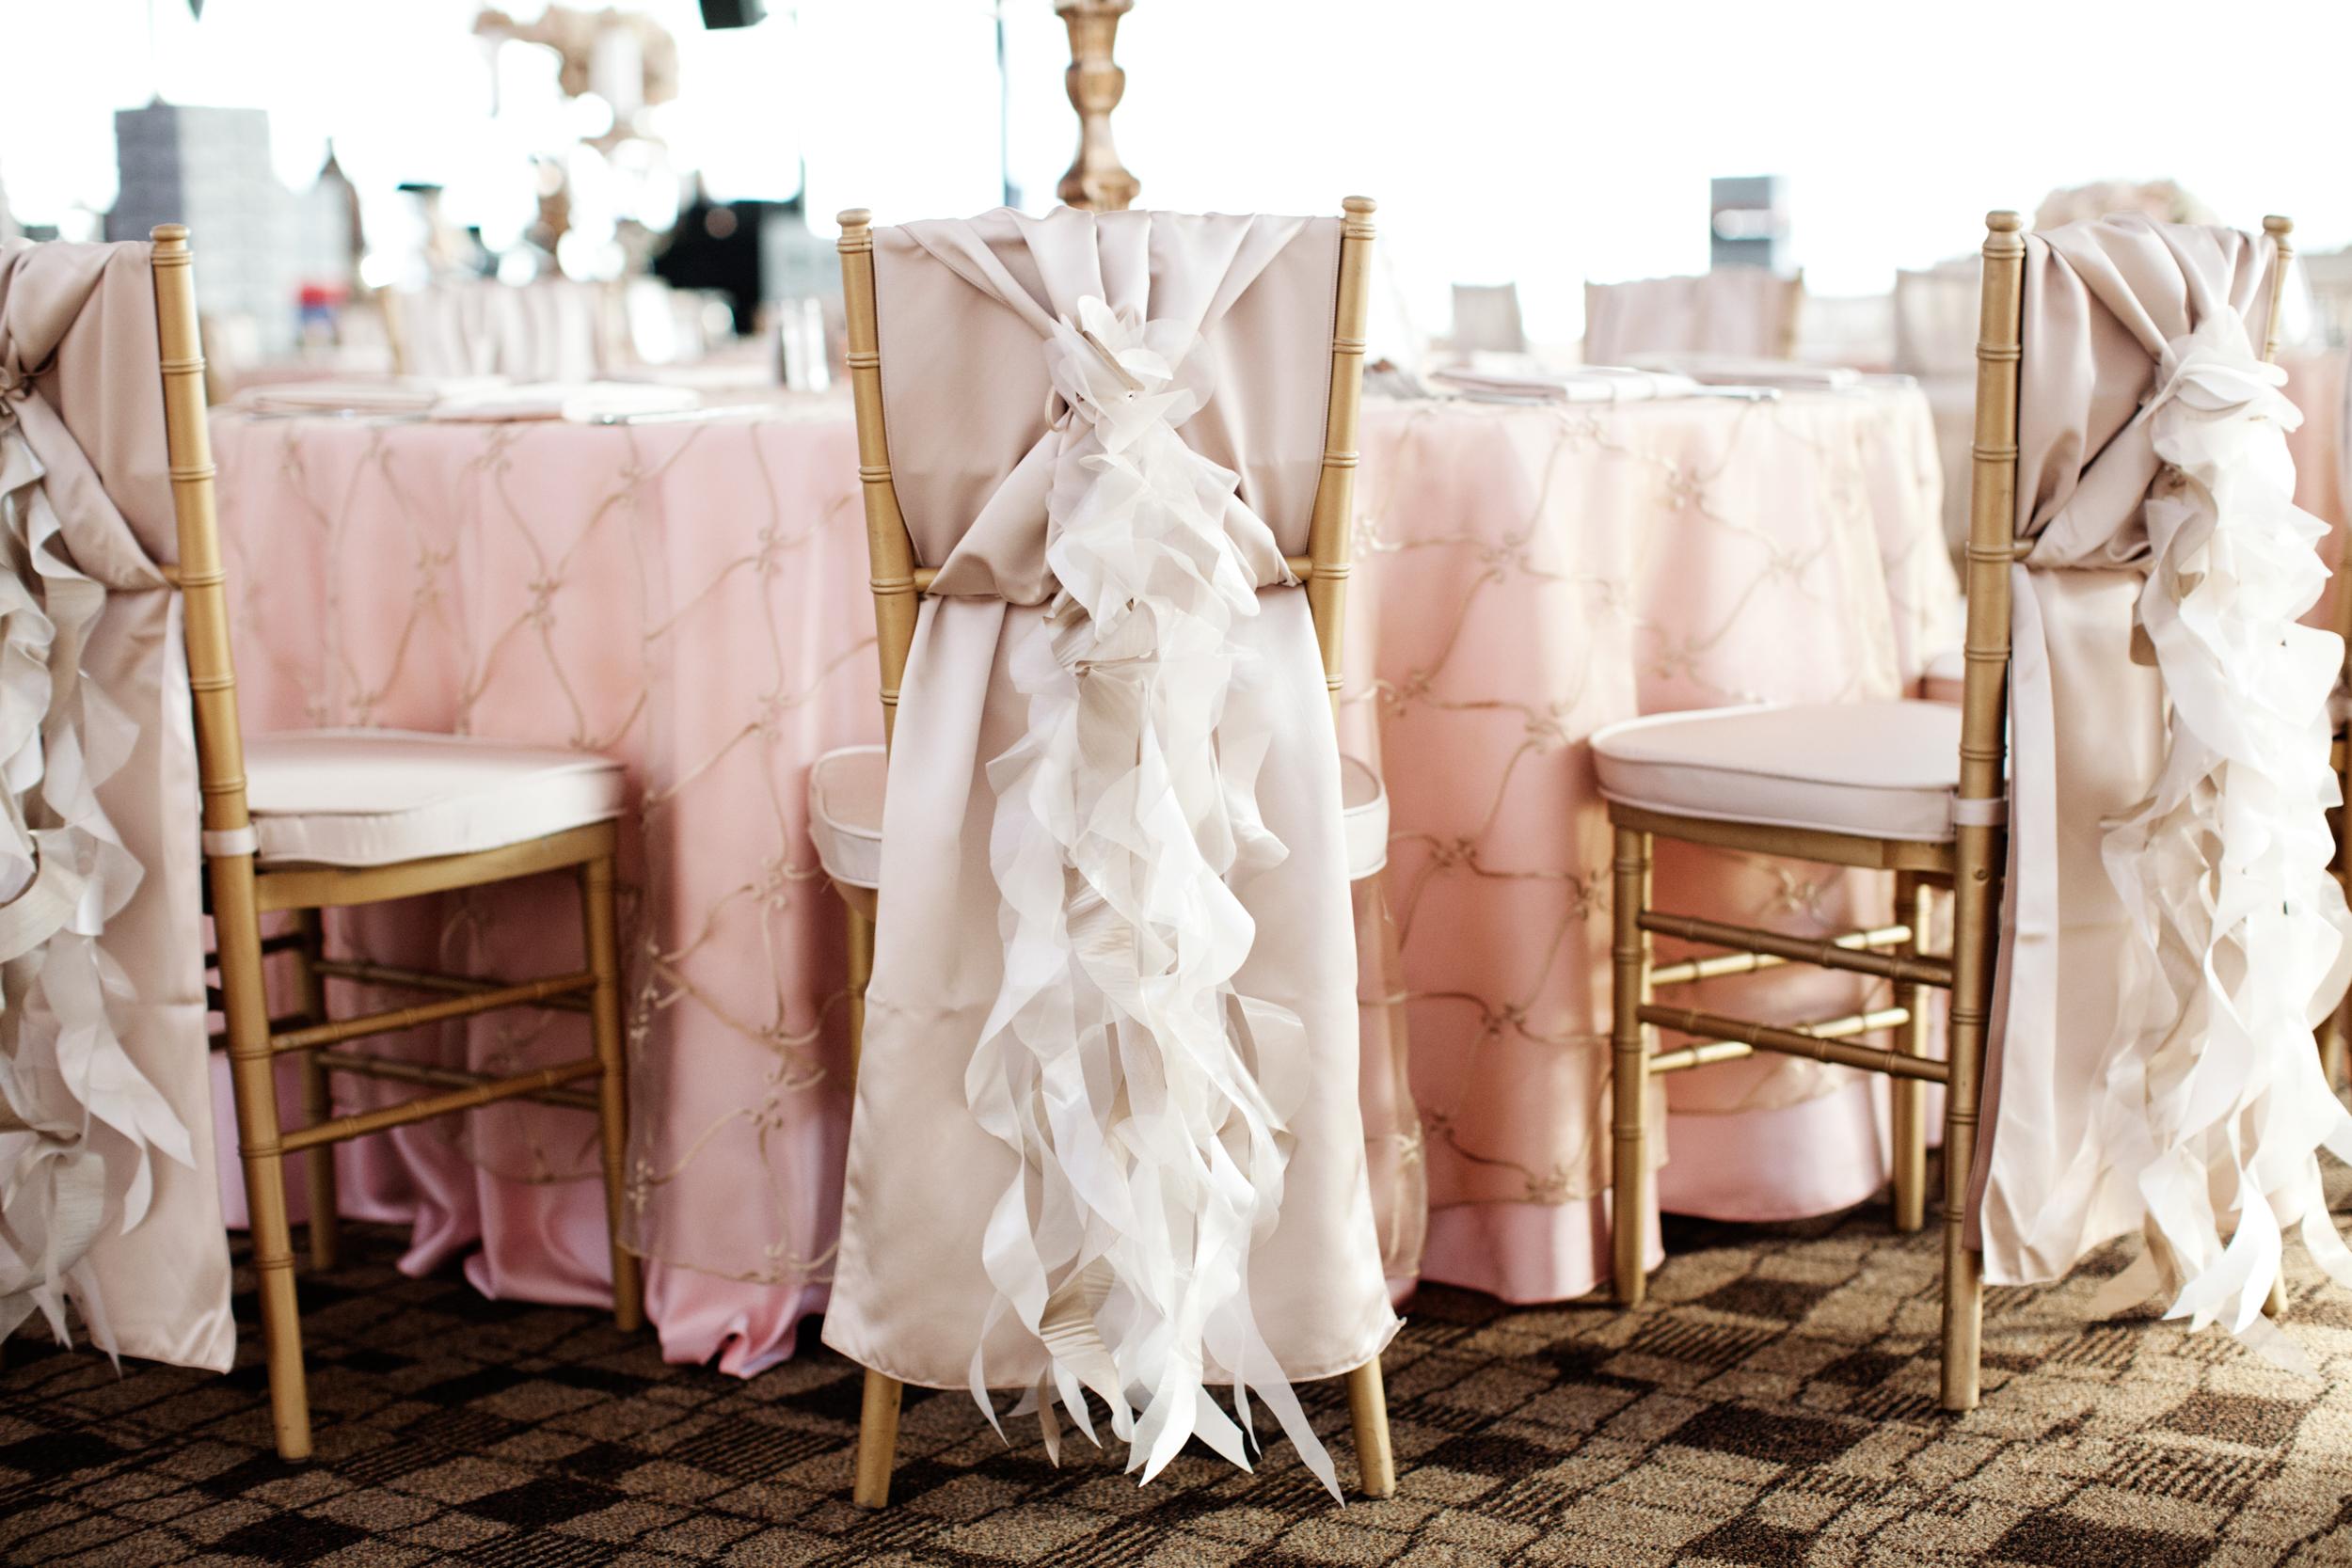 Ceci_New_York_Ceci_Style_Ceci_Johnson_Luxury_Lifestyle_Floral_Lace_Wedding_Letterpress_Inspiration_Design_Custom_Couture_Personalized_Invitations_-63.jpg